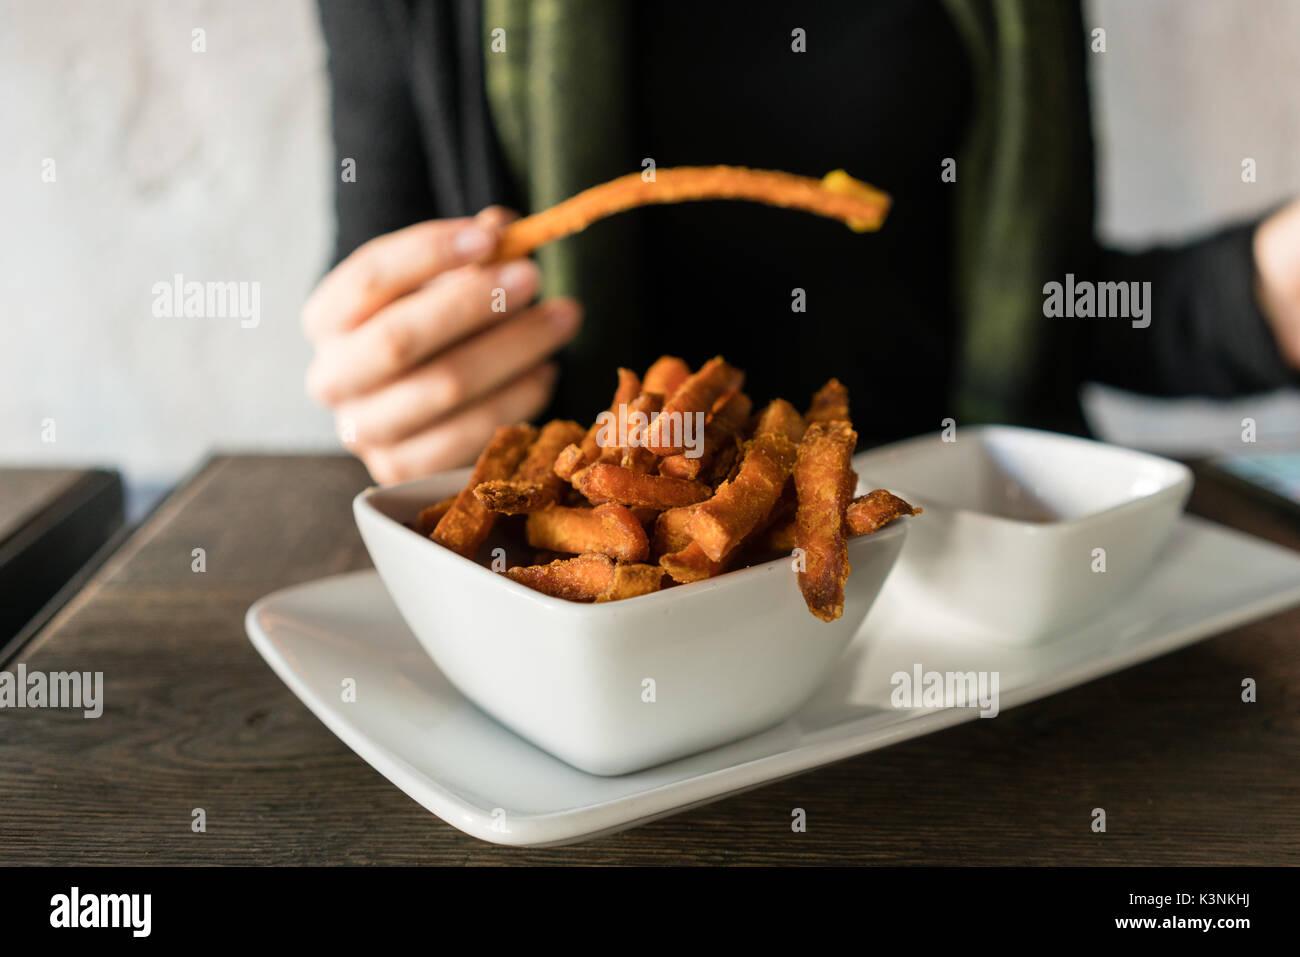 Woman eating sweet potato fries in restaurant - Stock Image